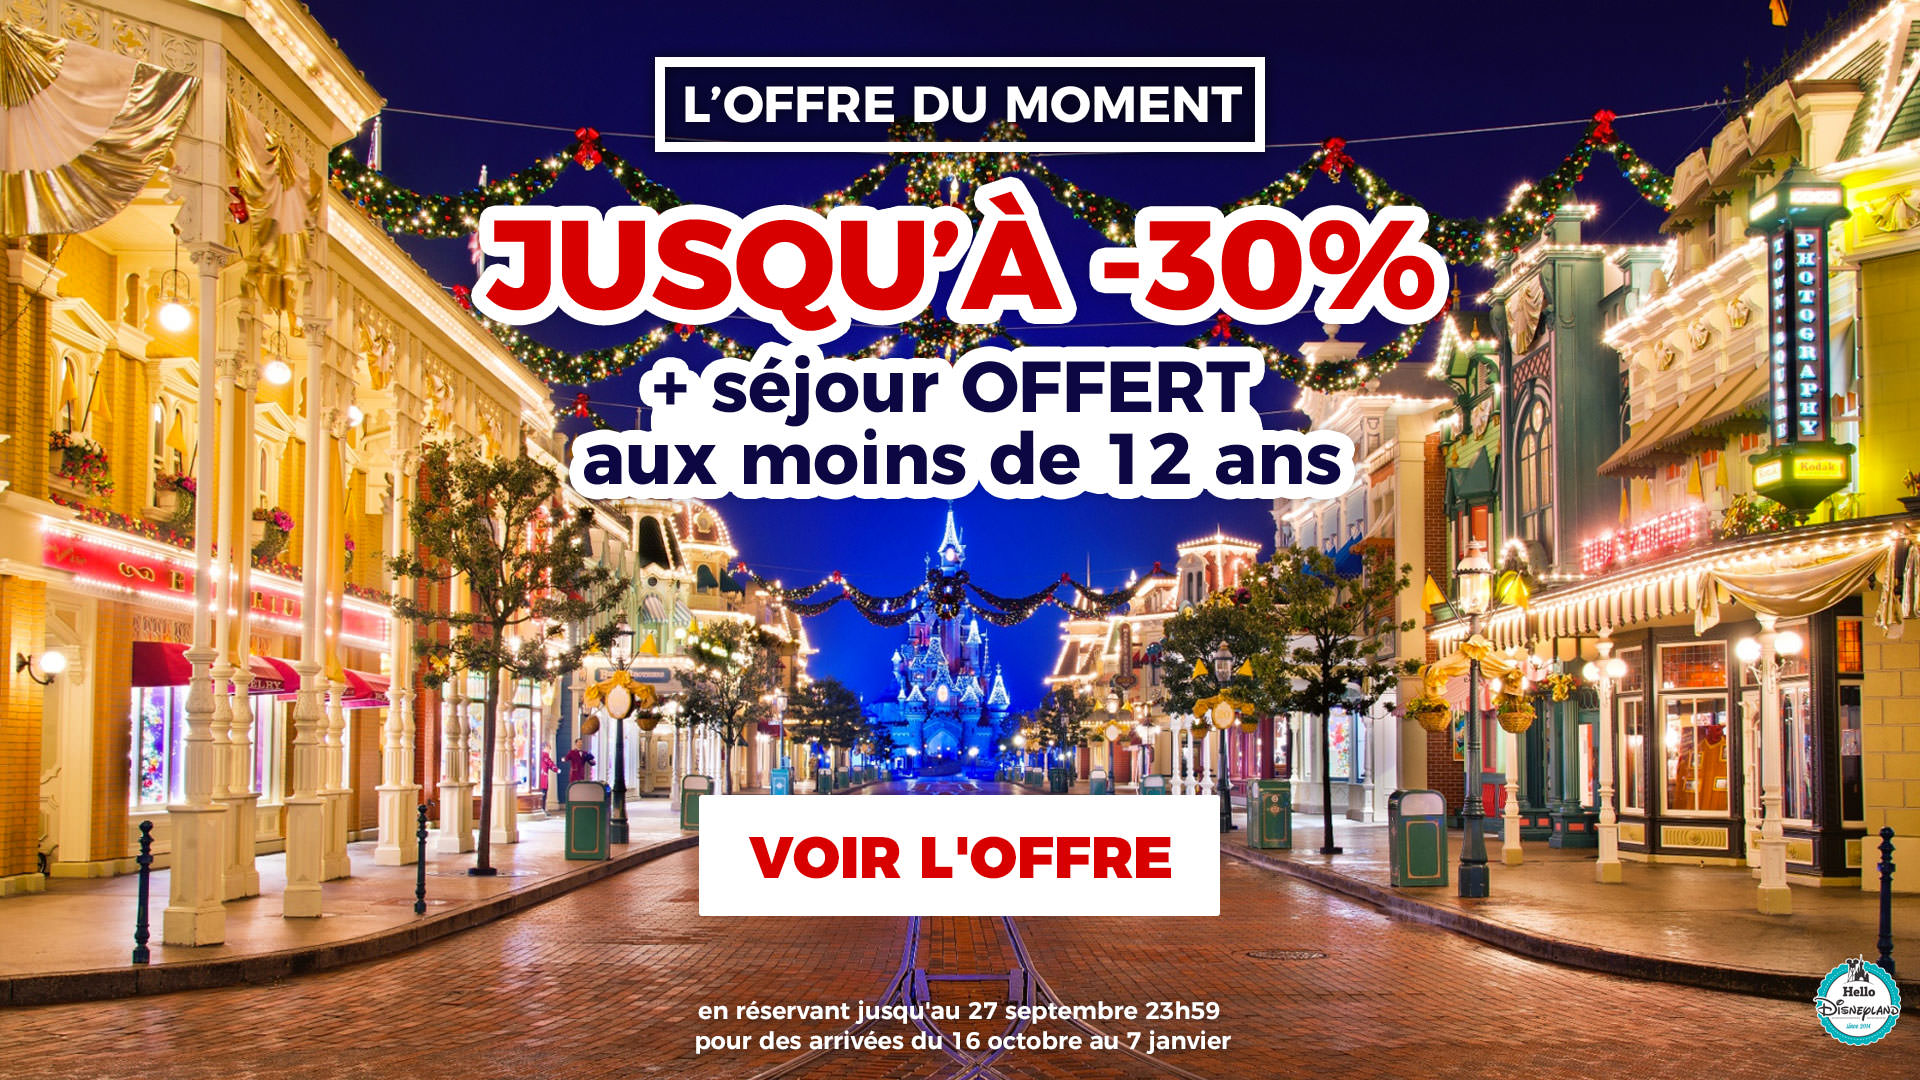 offres disneyland noel 2018 Hello Disneyland : Le blog n°1 sur Disneyland Paris | Promo  offres disneyland noel 2018